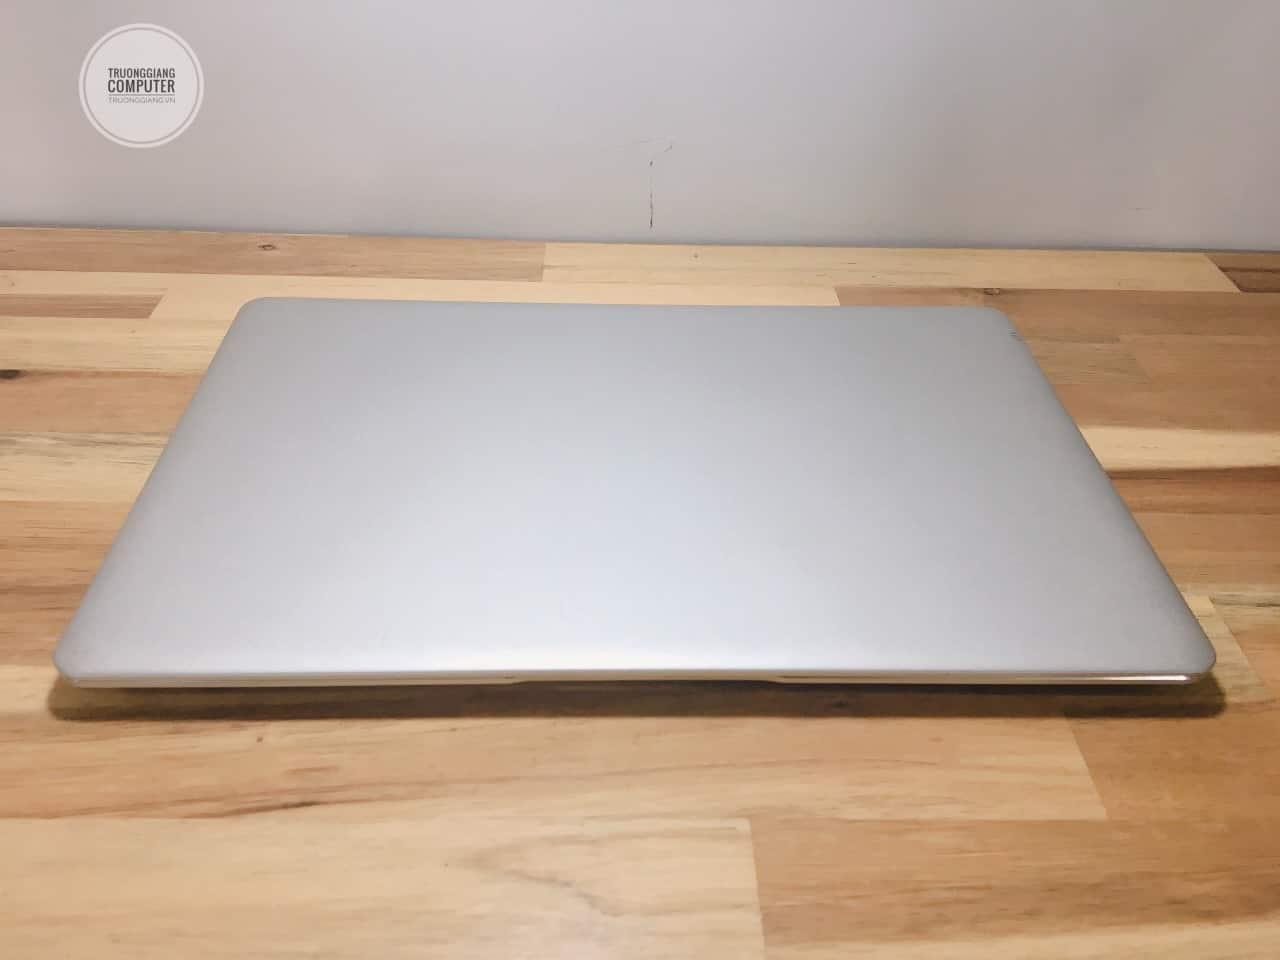 Thiết kế Laptop Notebook Masstel L133 mỏng nhẹ